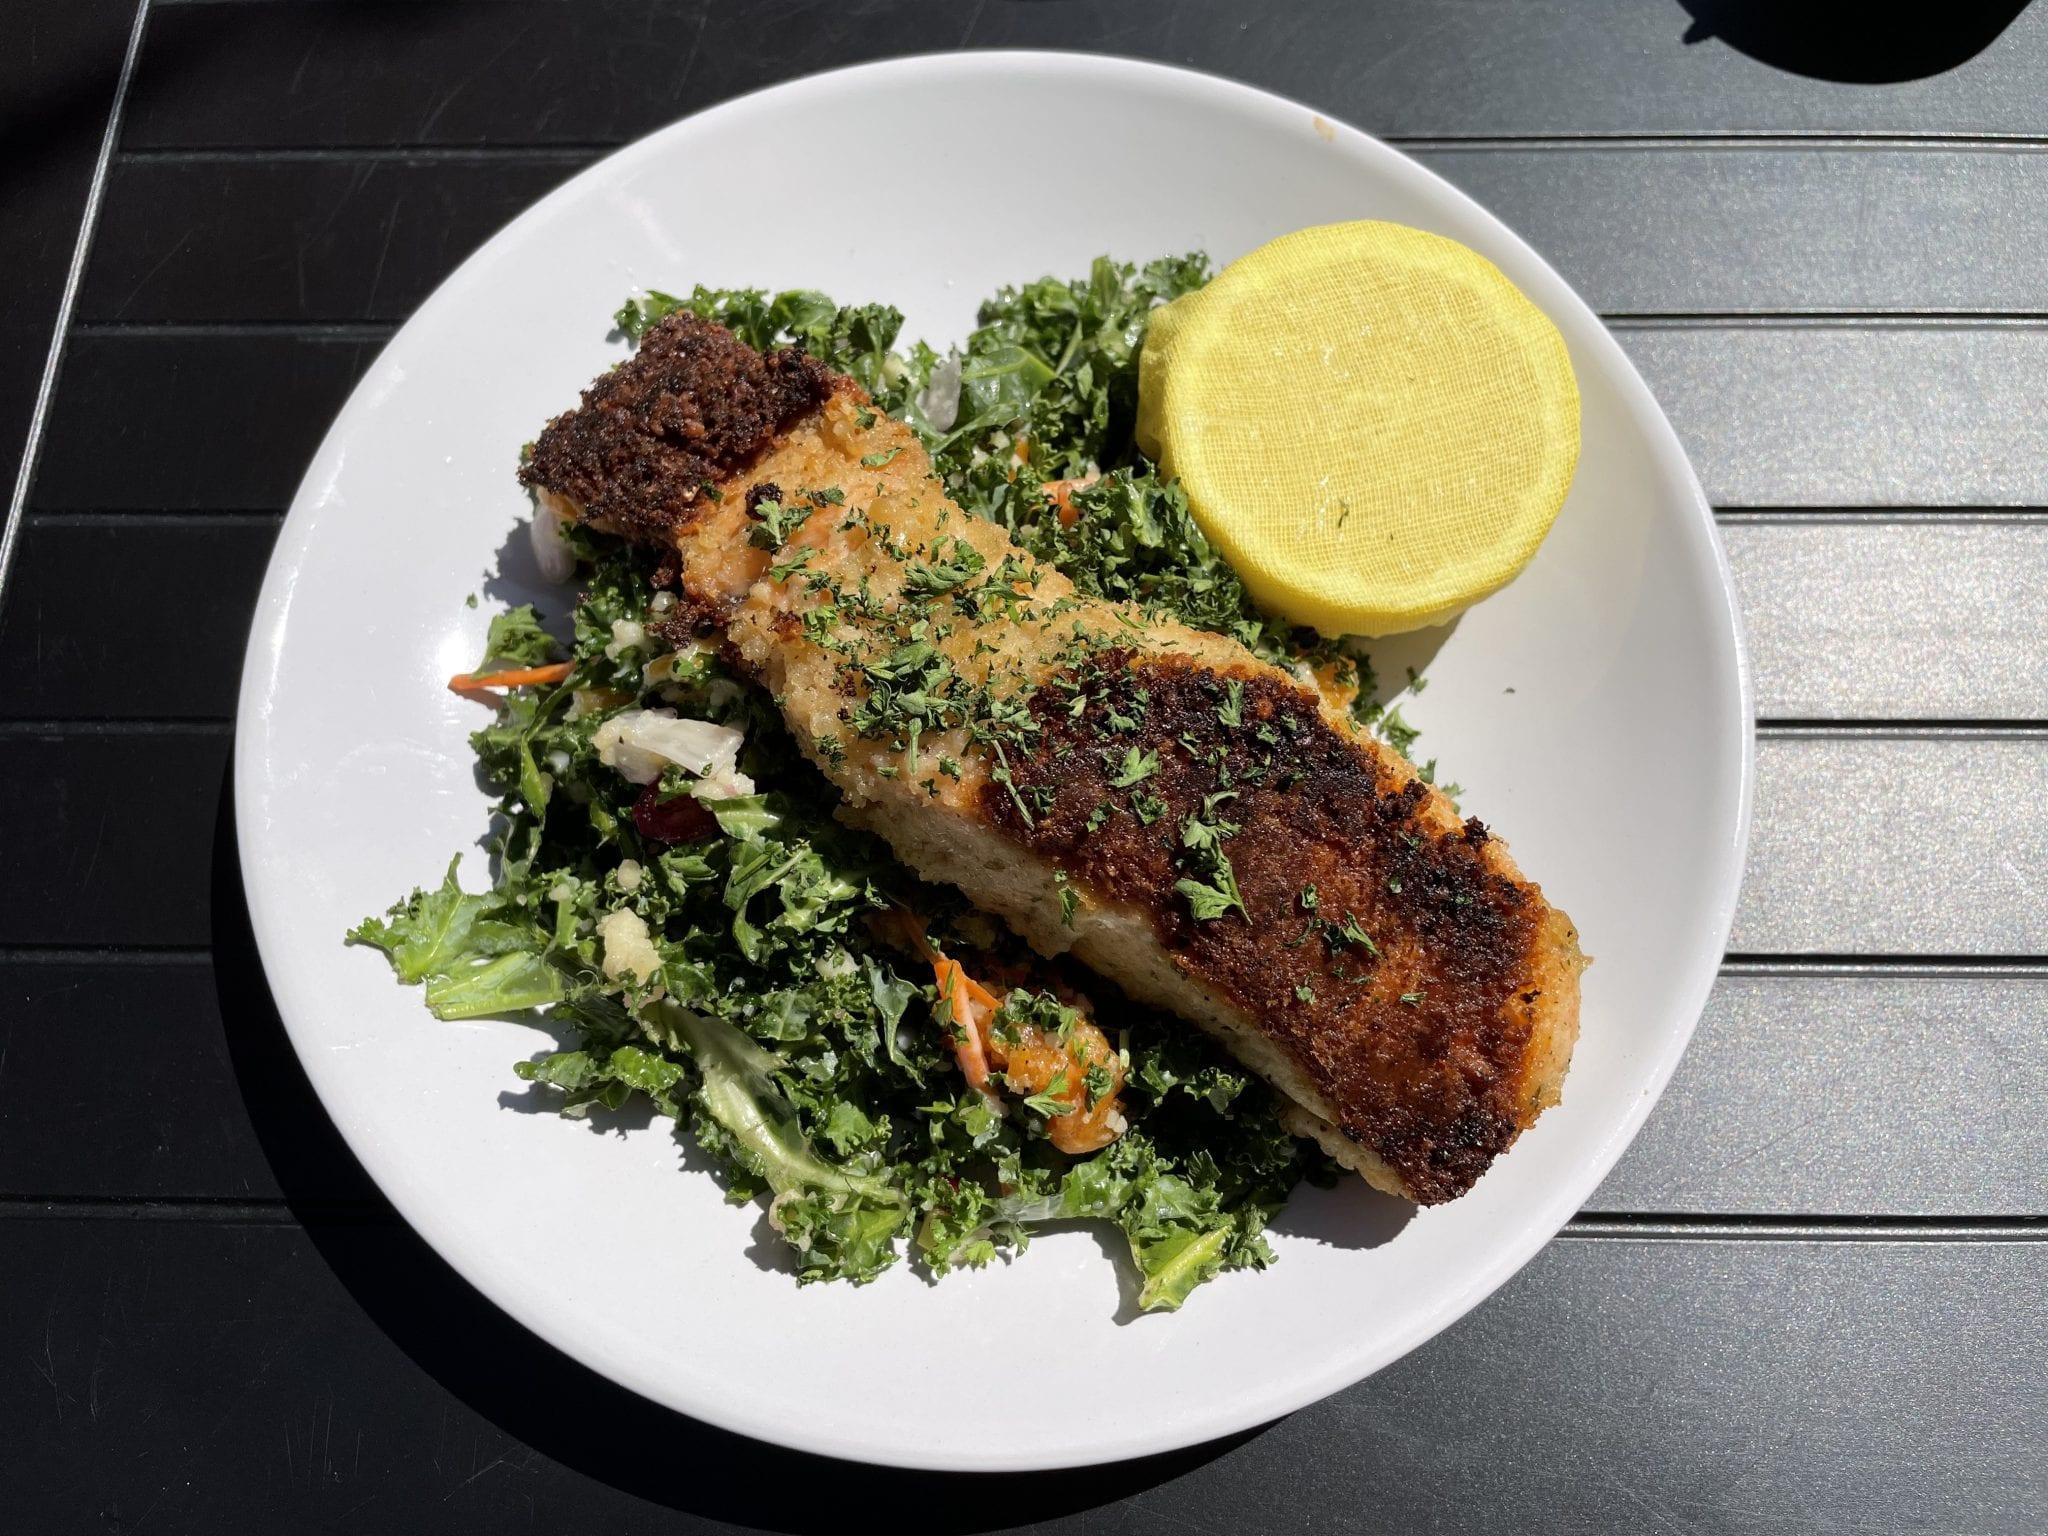 The salmon kale coucous salad is a go-to favorite. (Photo: Kelli Goel)